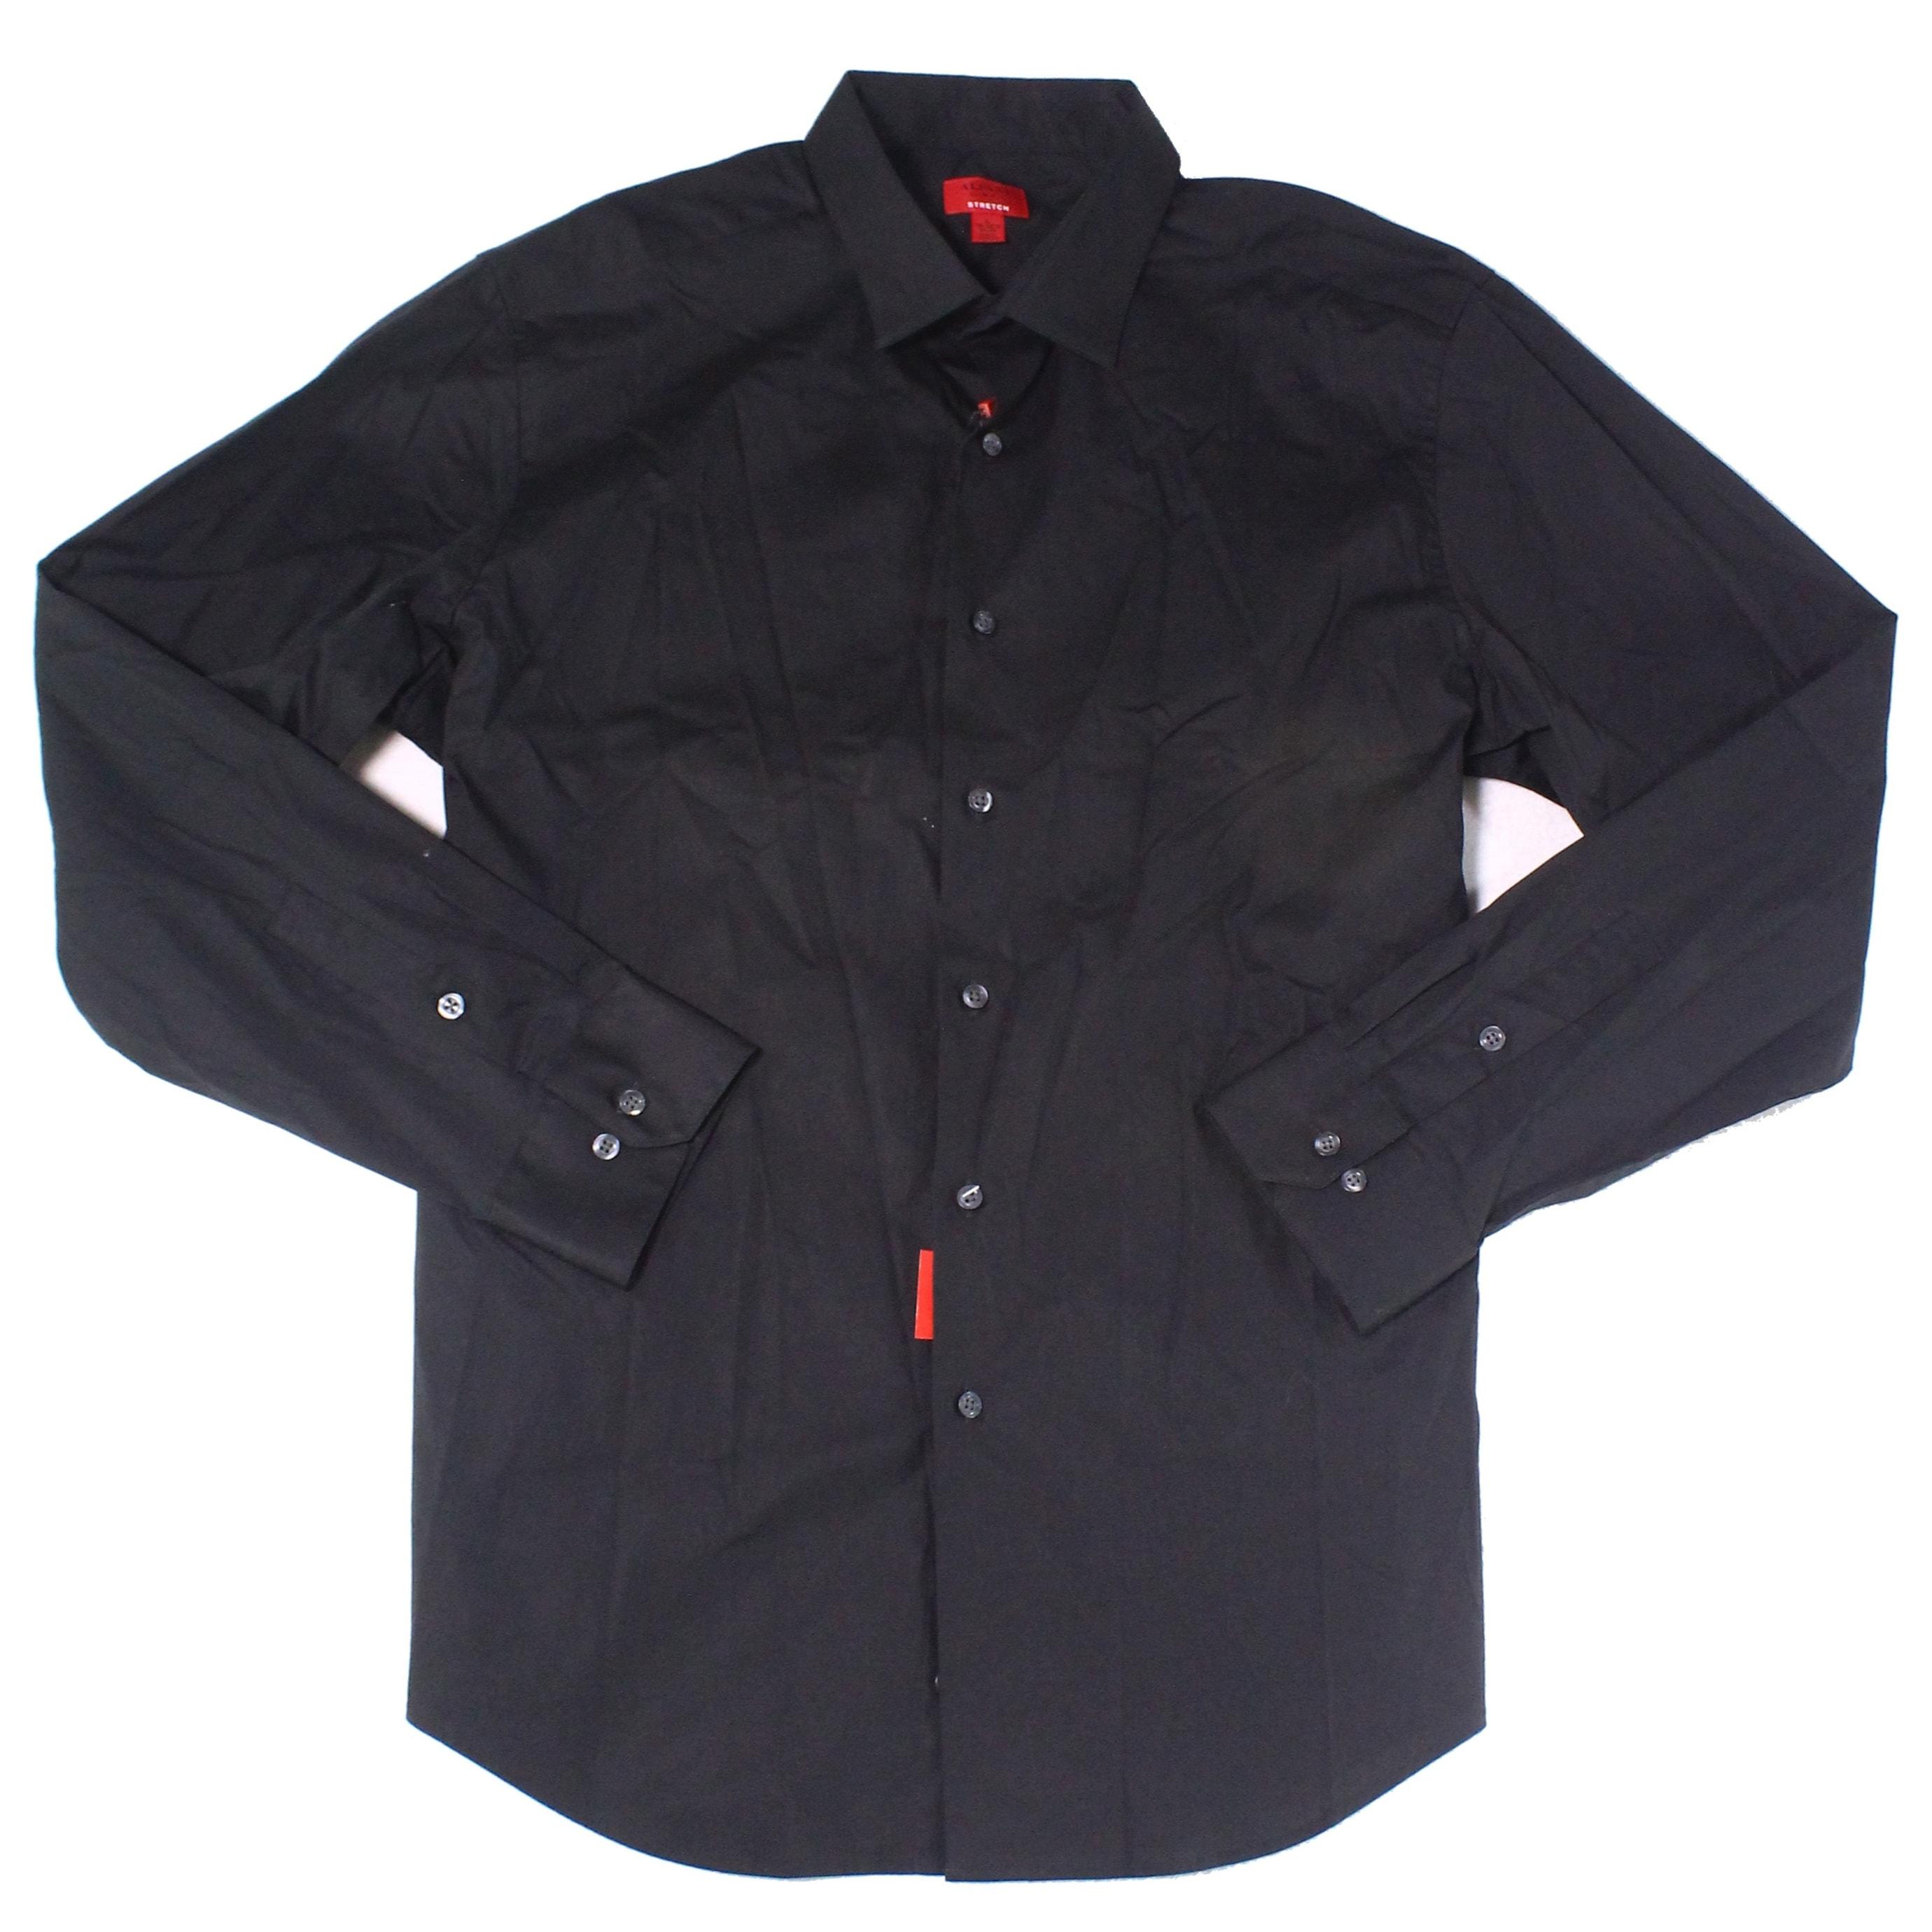 570344bc4 Buy Alfani Dress Shirts Online at Overstock